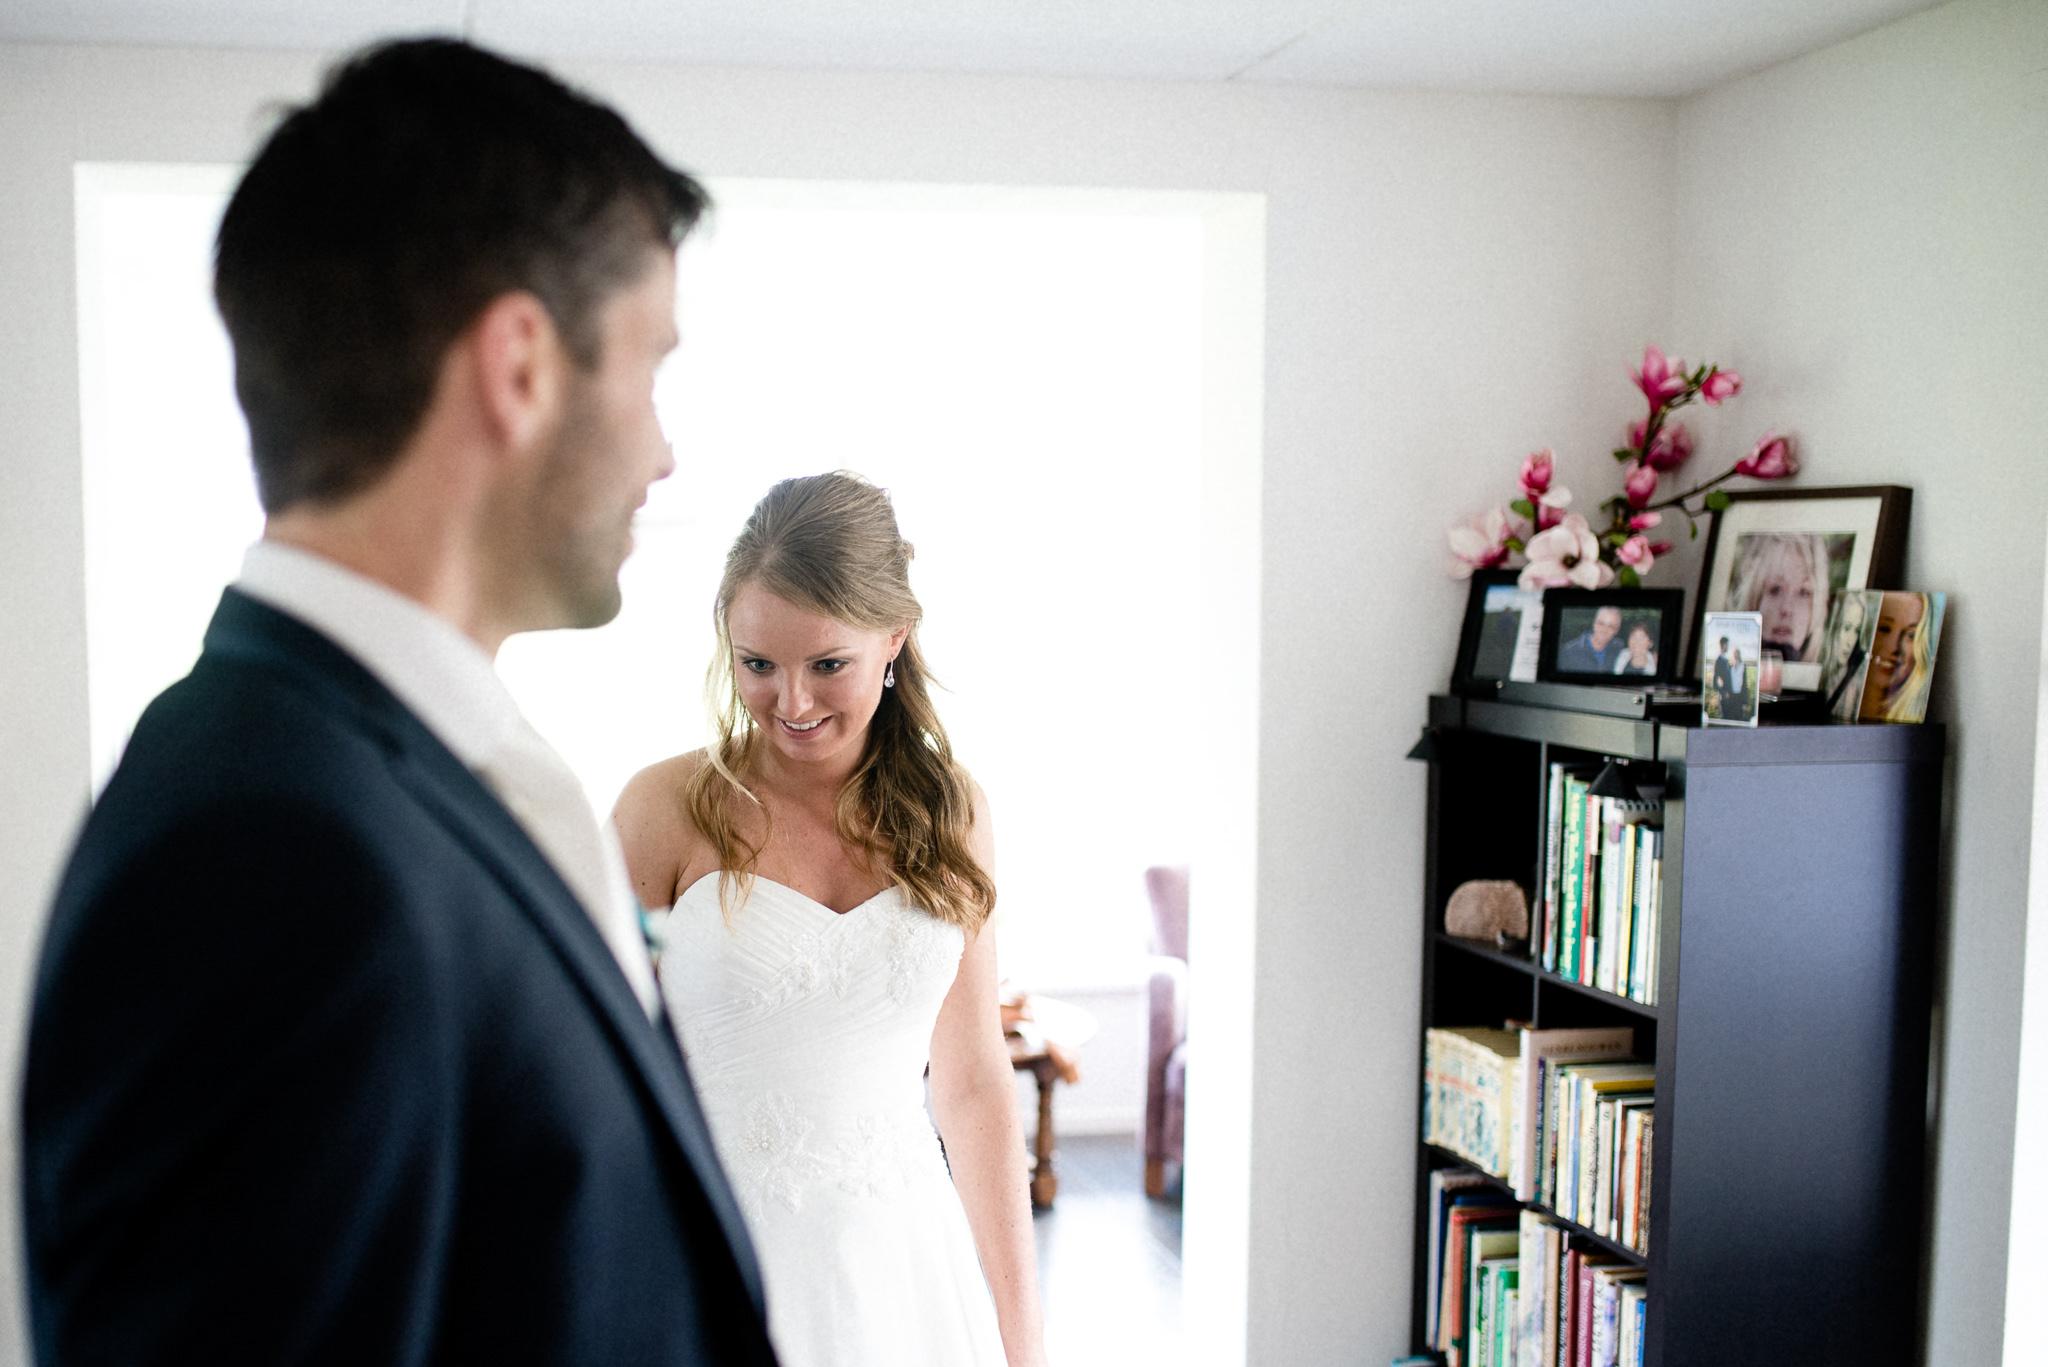 08 van 51 - trouwfotografie-gelske-reinier-friesland - 2055